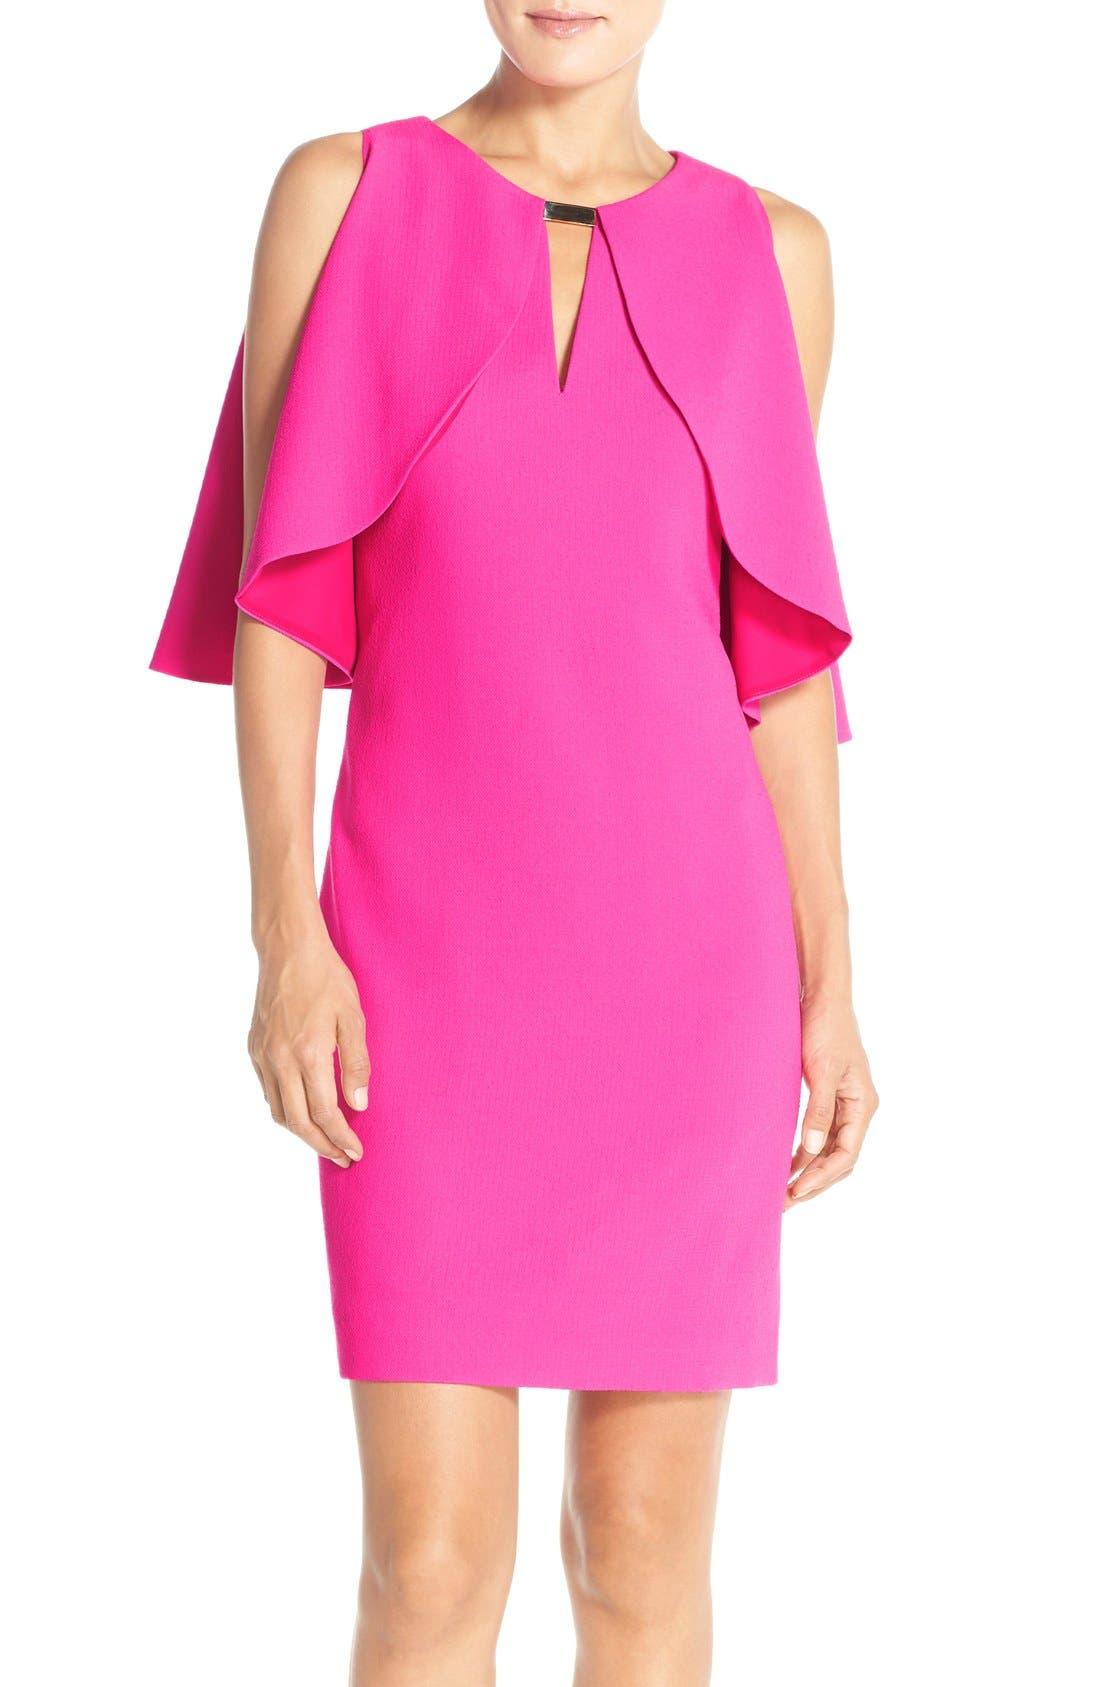 Alternate Image 1 Selected - Trina Turk 'Redford' Shift Dress